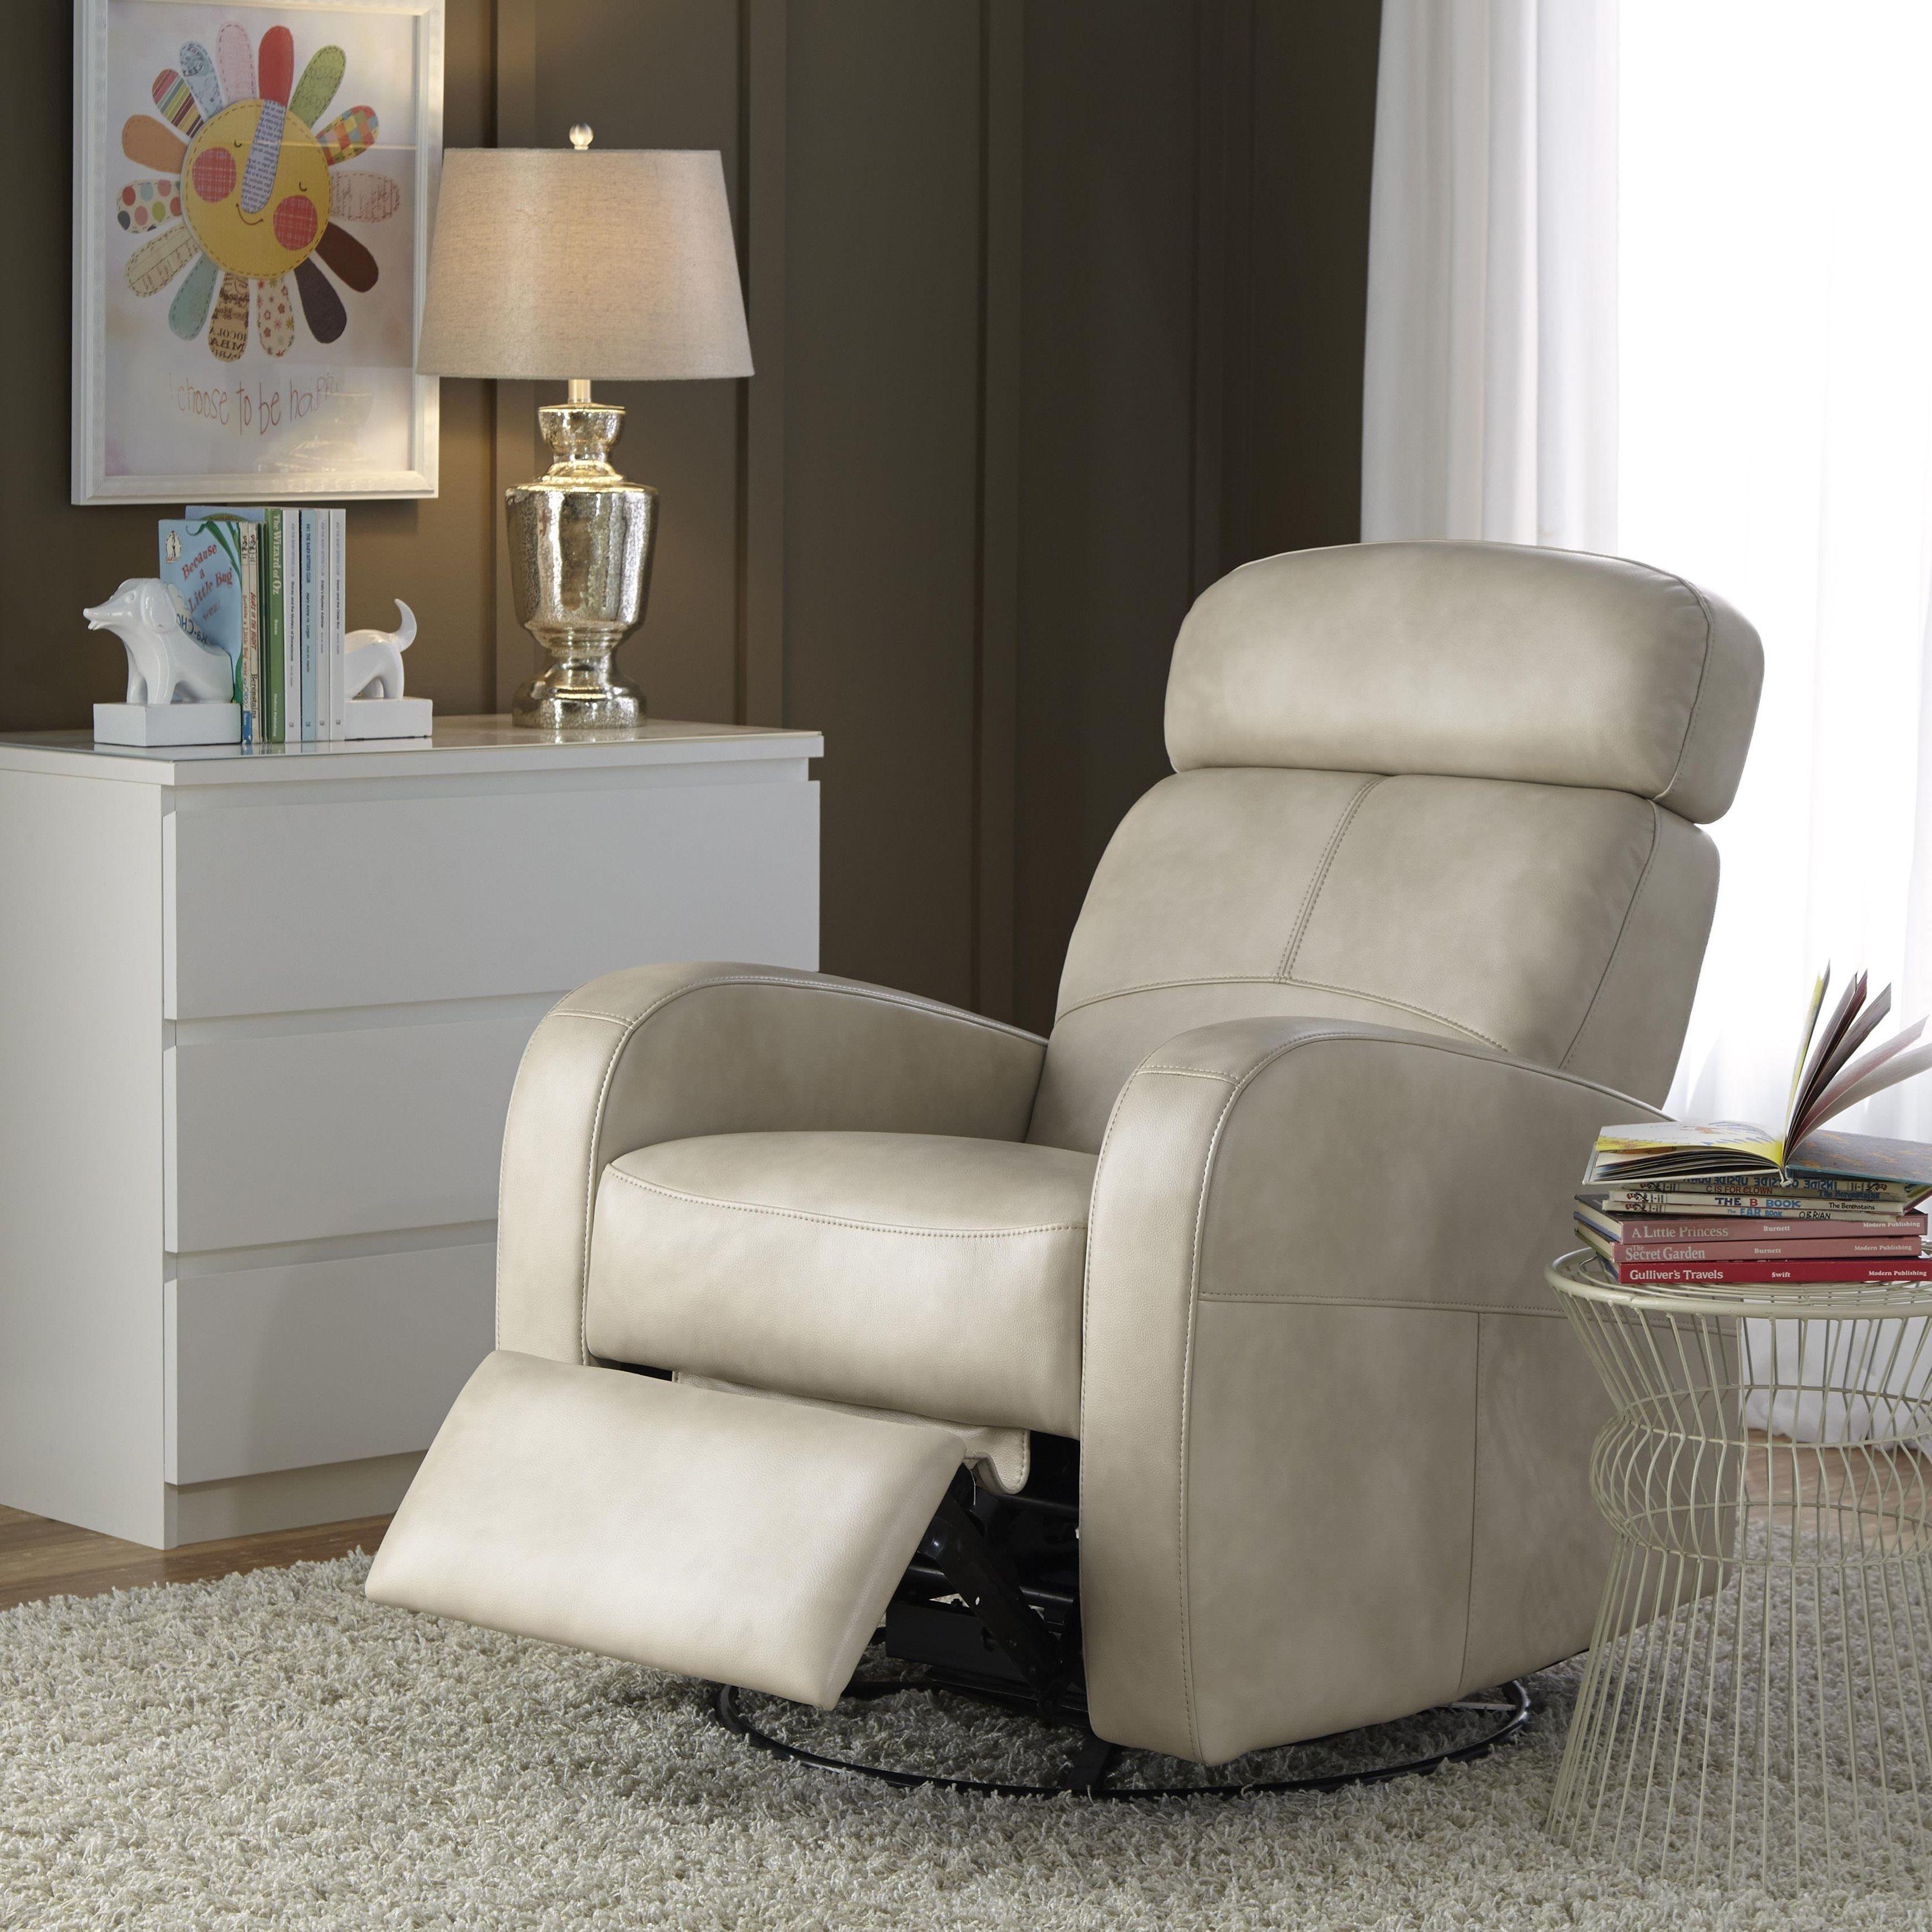 Isla Cream (Ivory) Nursery Swivel Glider Recliner Chair (Faux Leather)